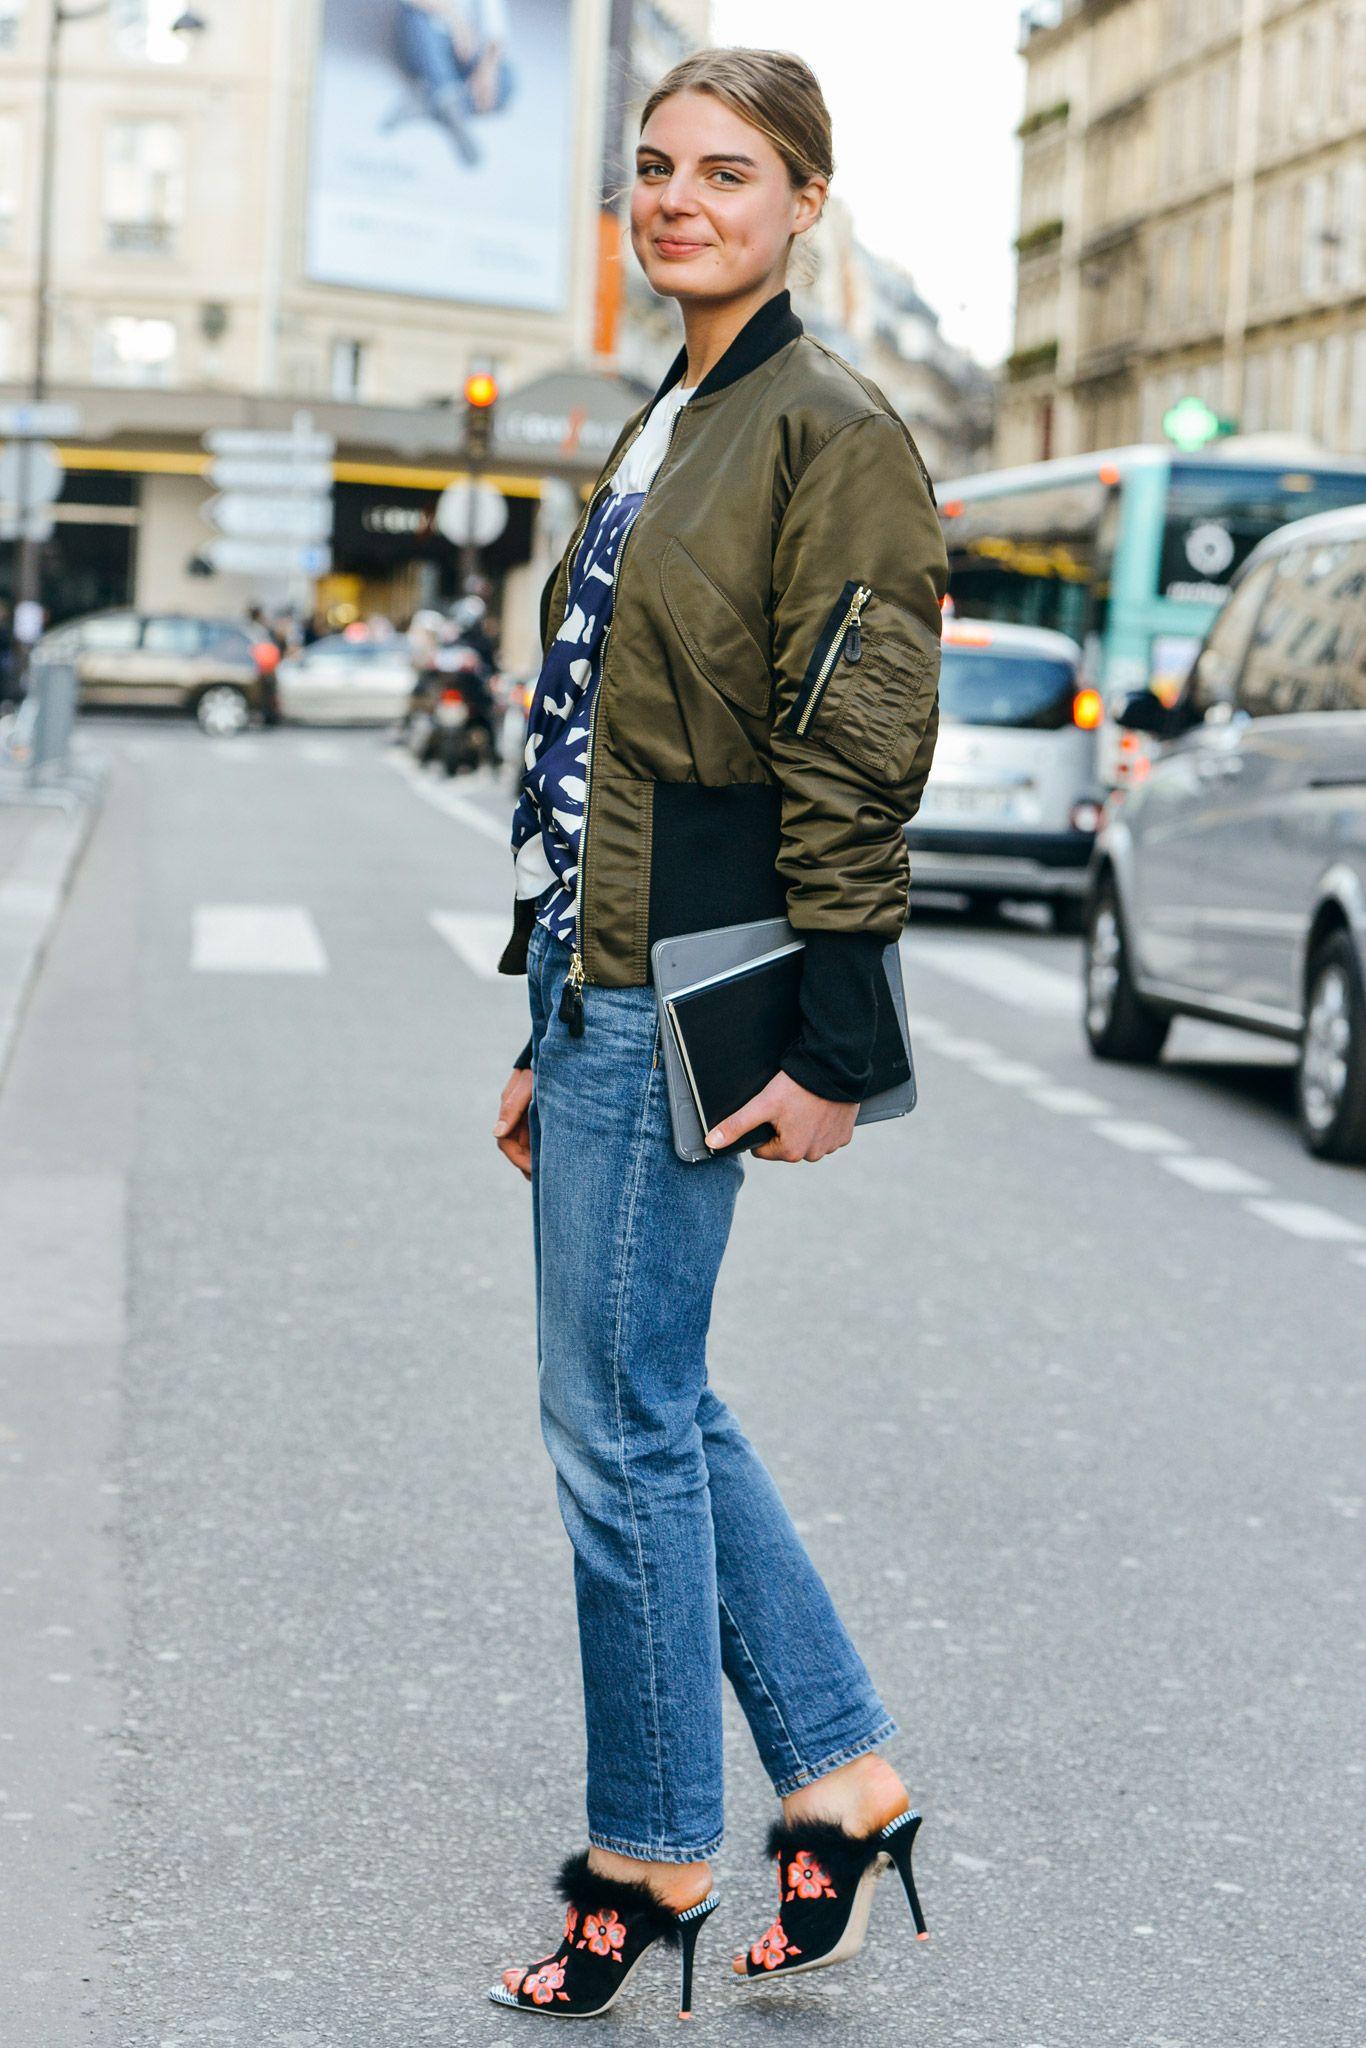 zelenapfw-fw15-street-style-bomber-jacket